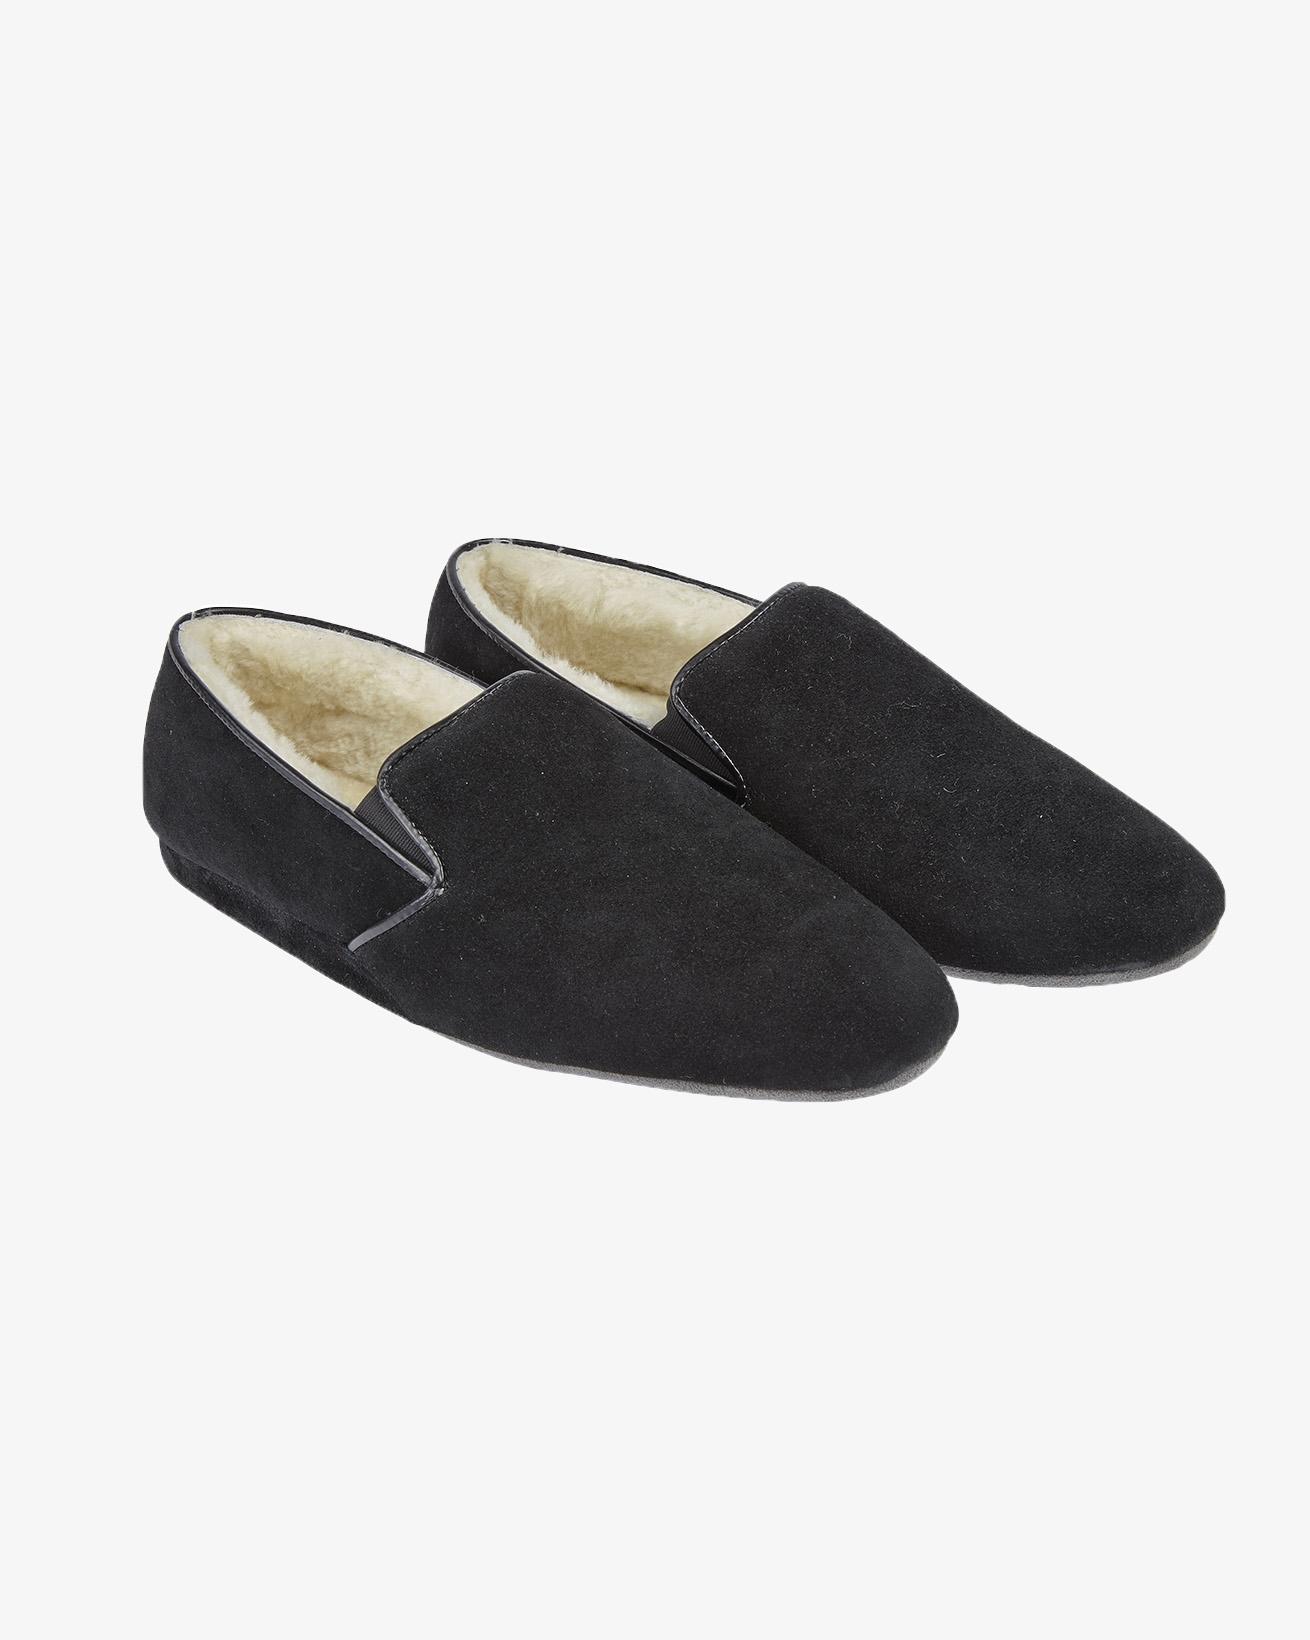 Ladies Cromarty Slipper - Size 7 - Black